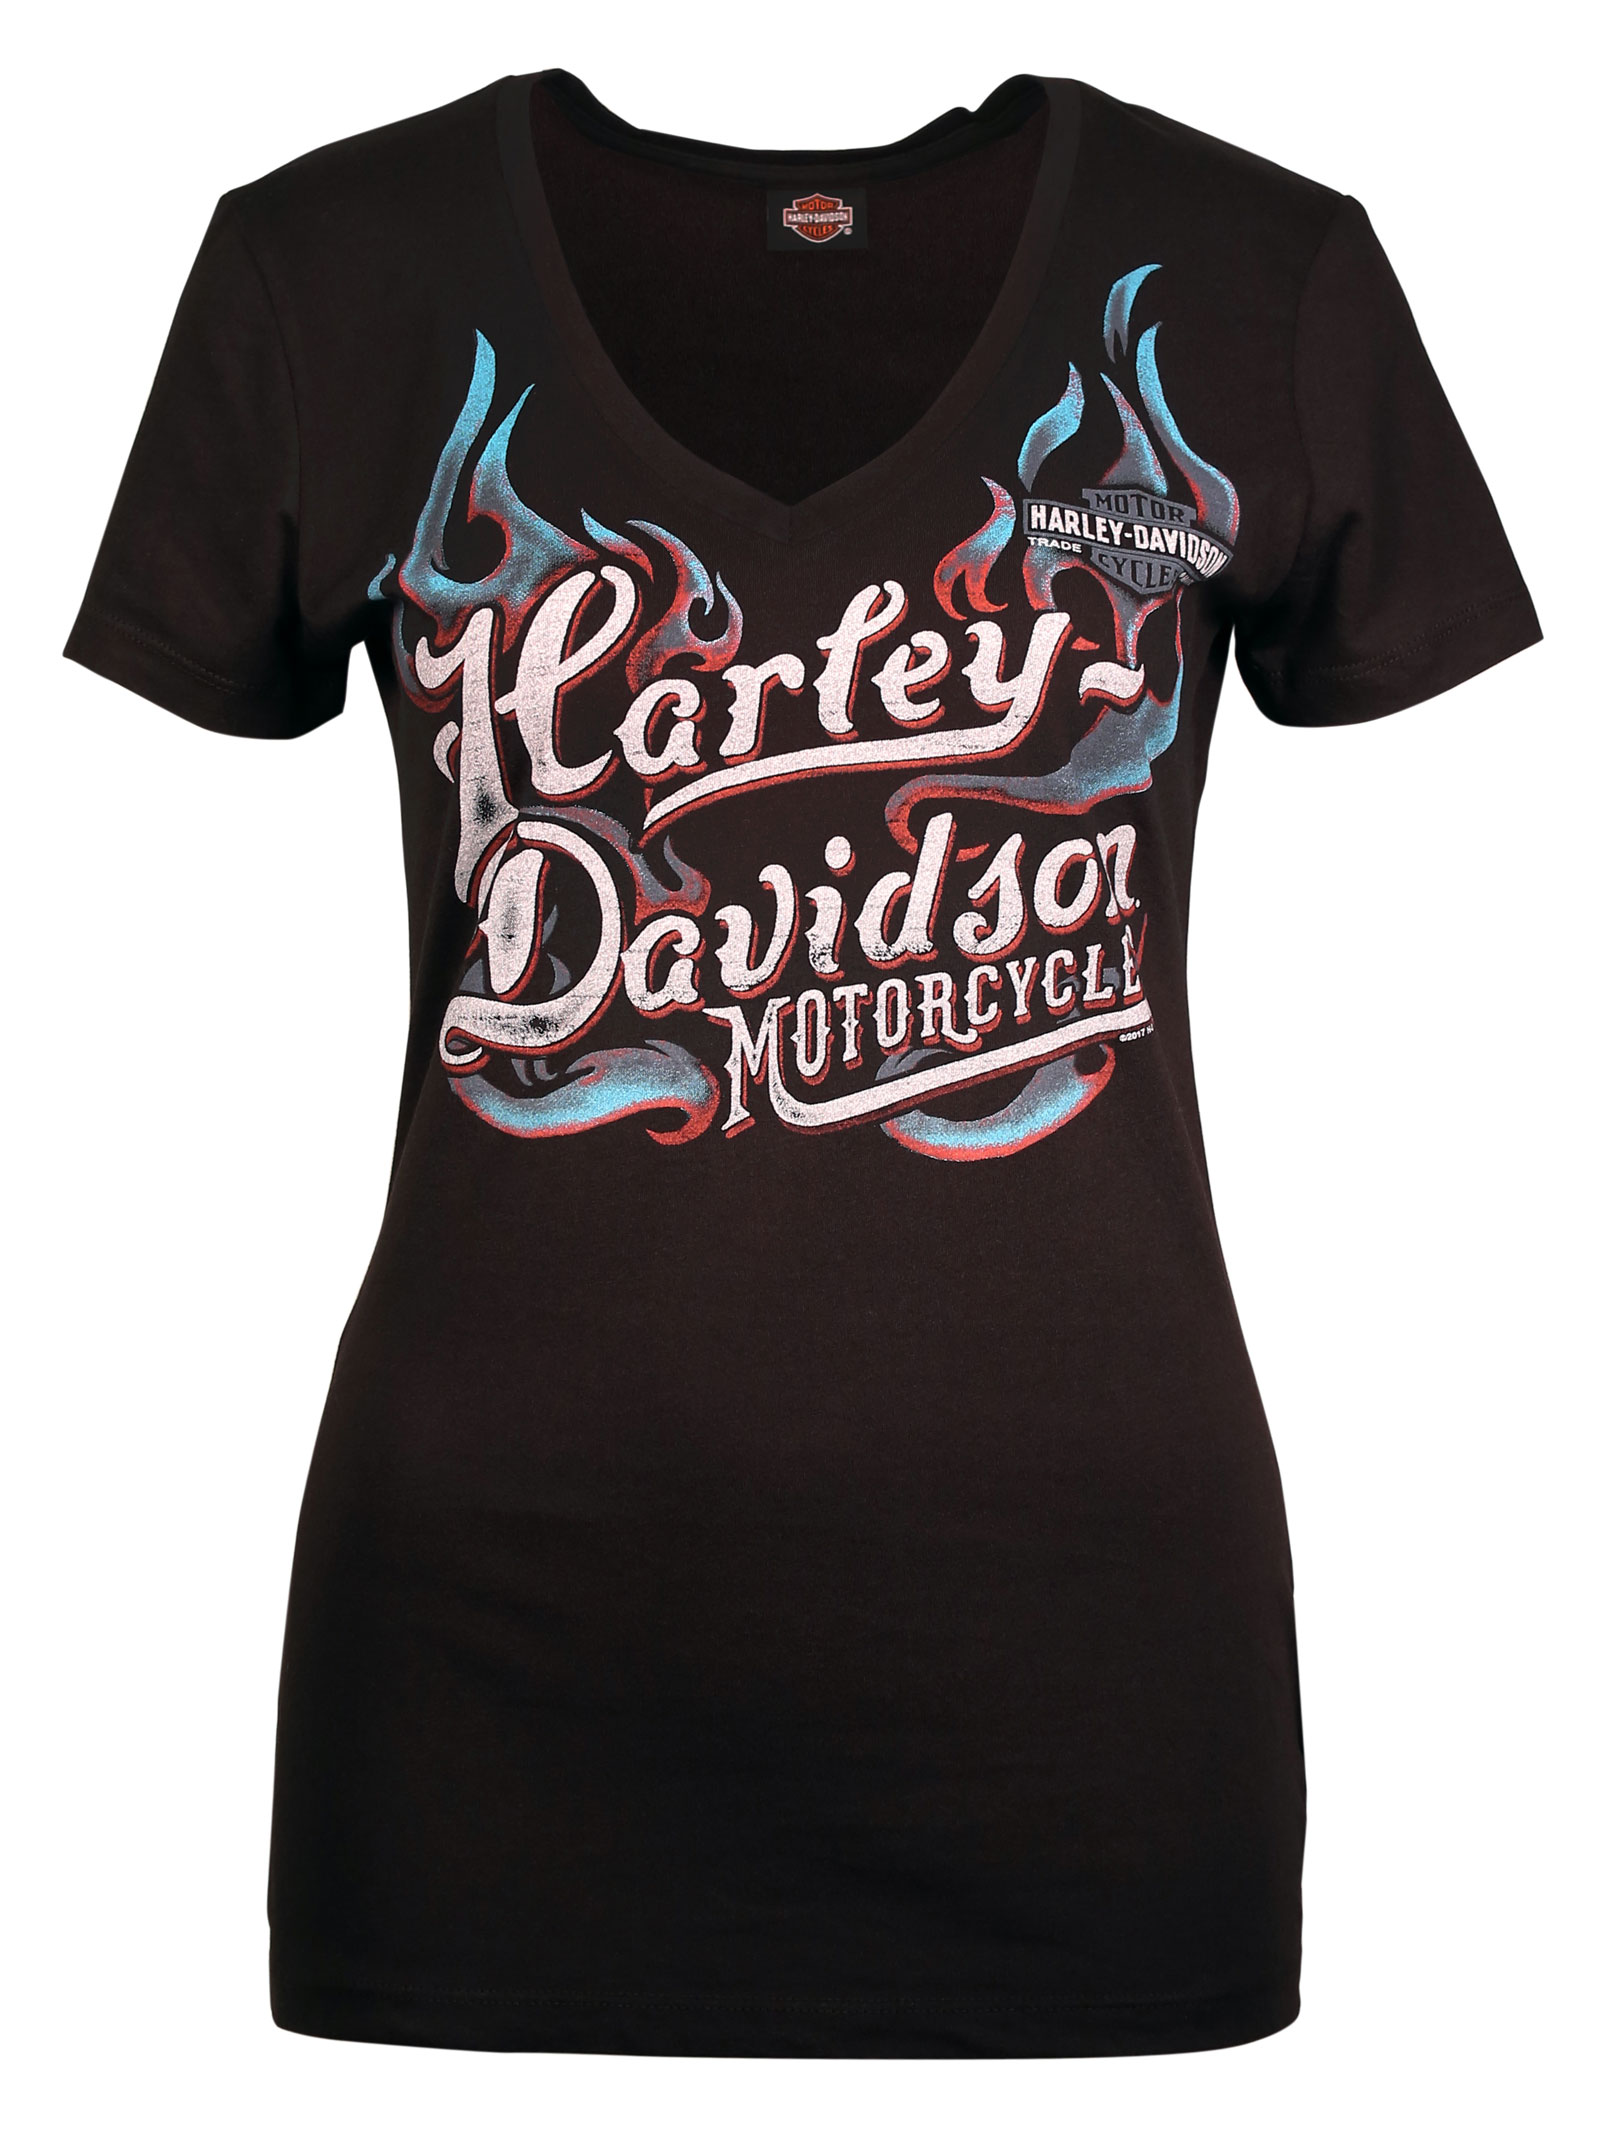 harley davidson women 39 s t shirt chains of fire at. Black Bedroom Furniture Sets. Home Design Ideas